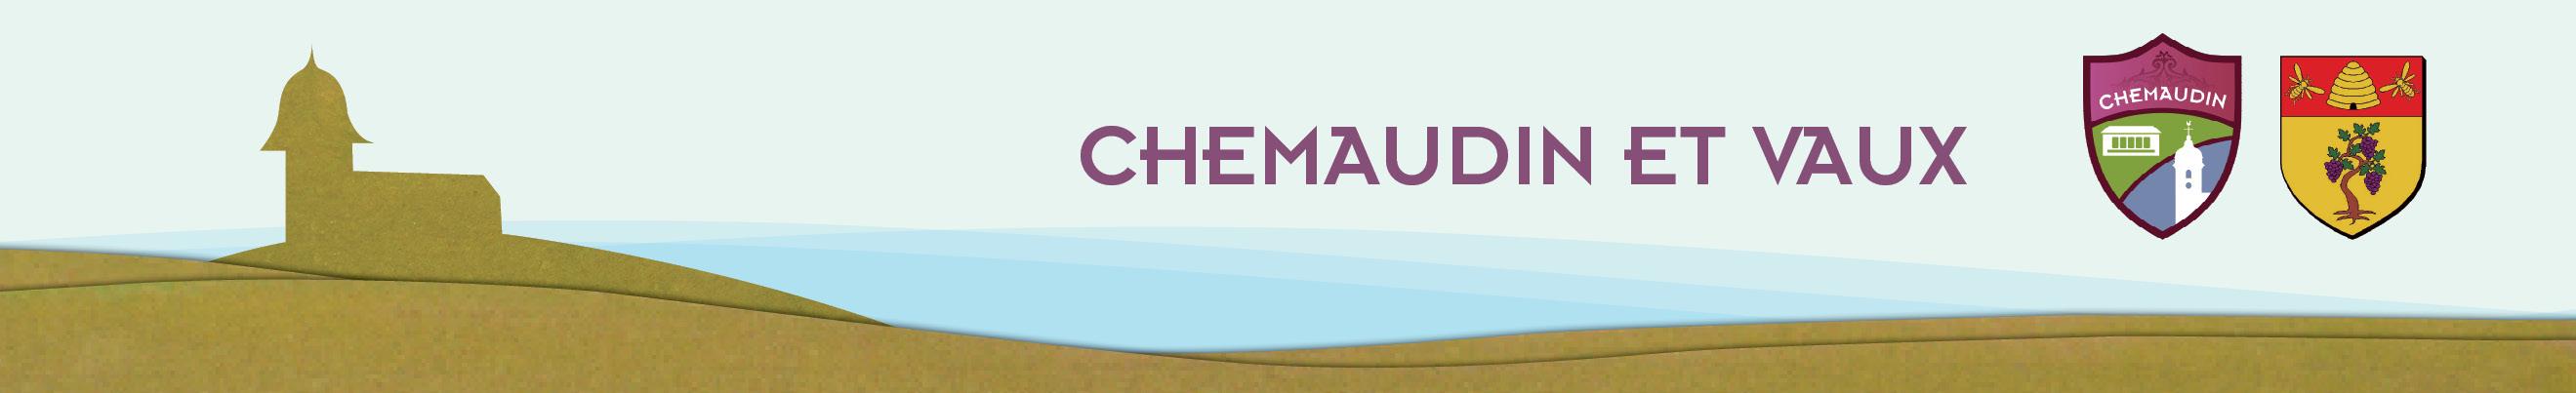 Commune de Chemaudin et Vaux